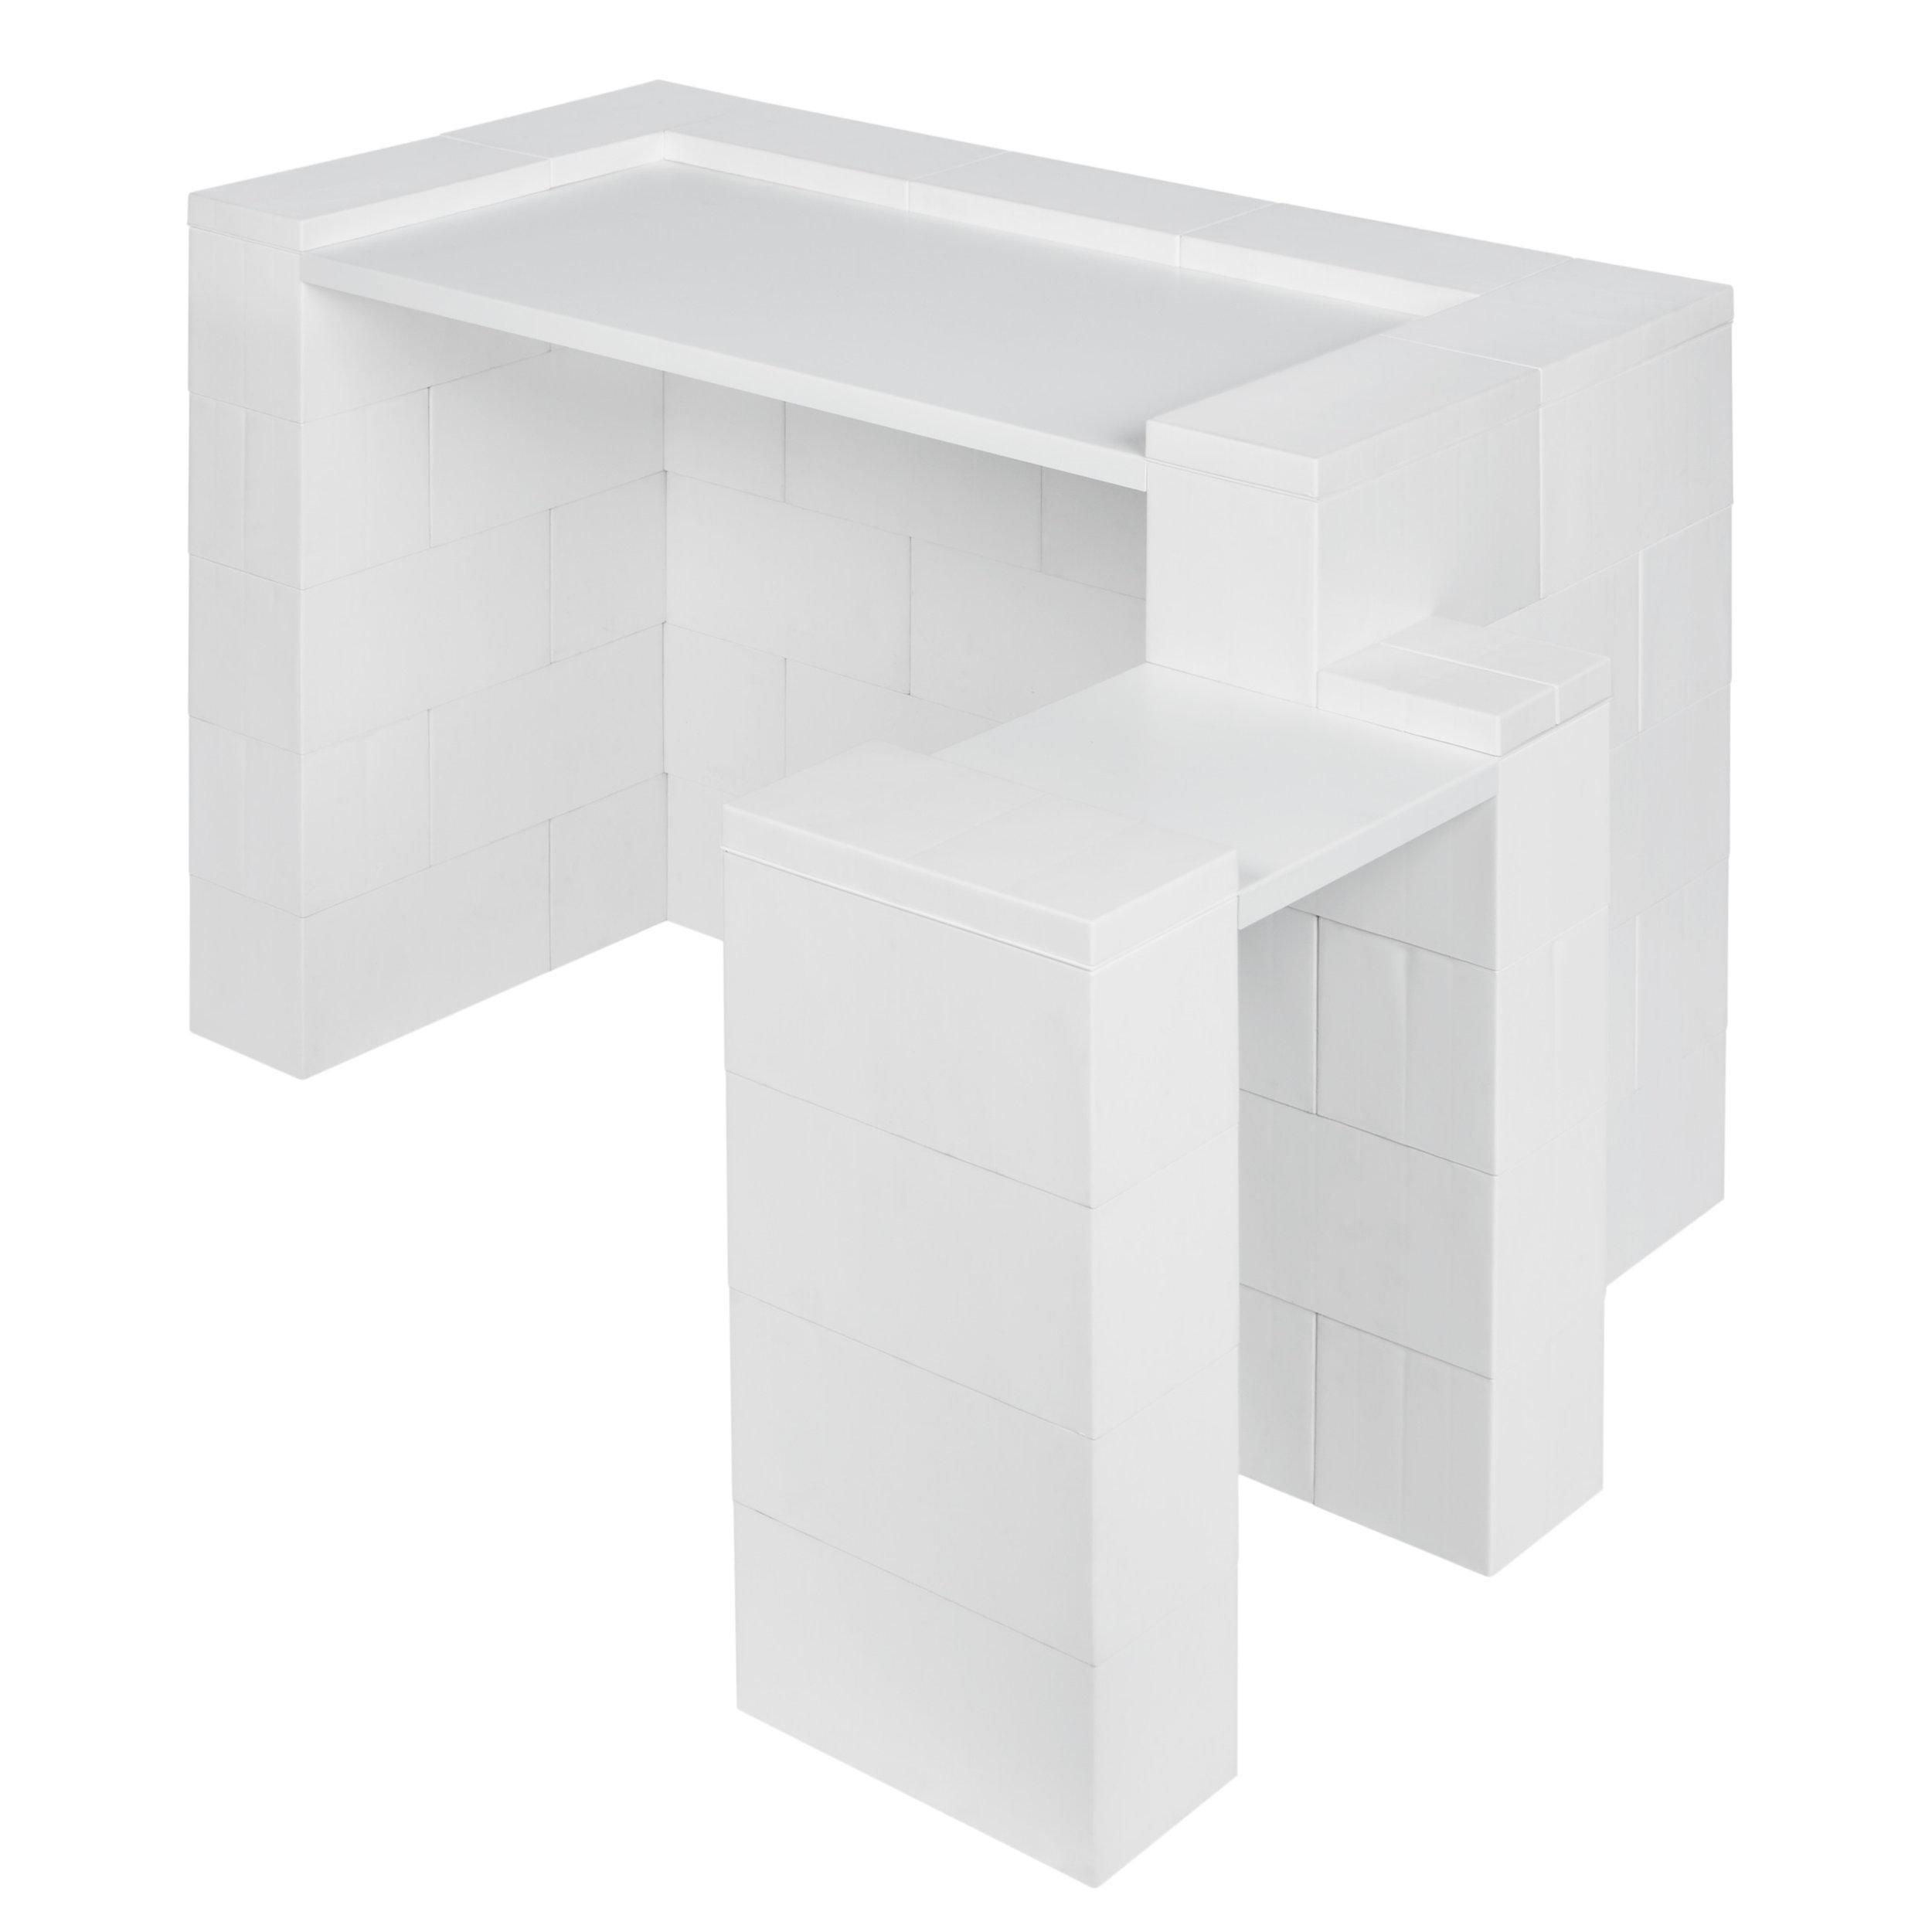 Desk Kits